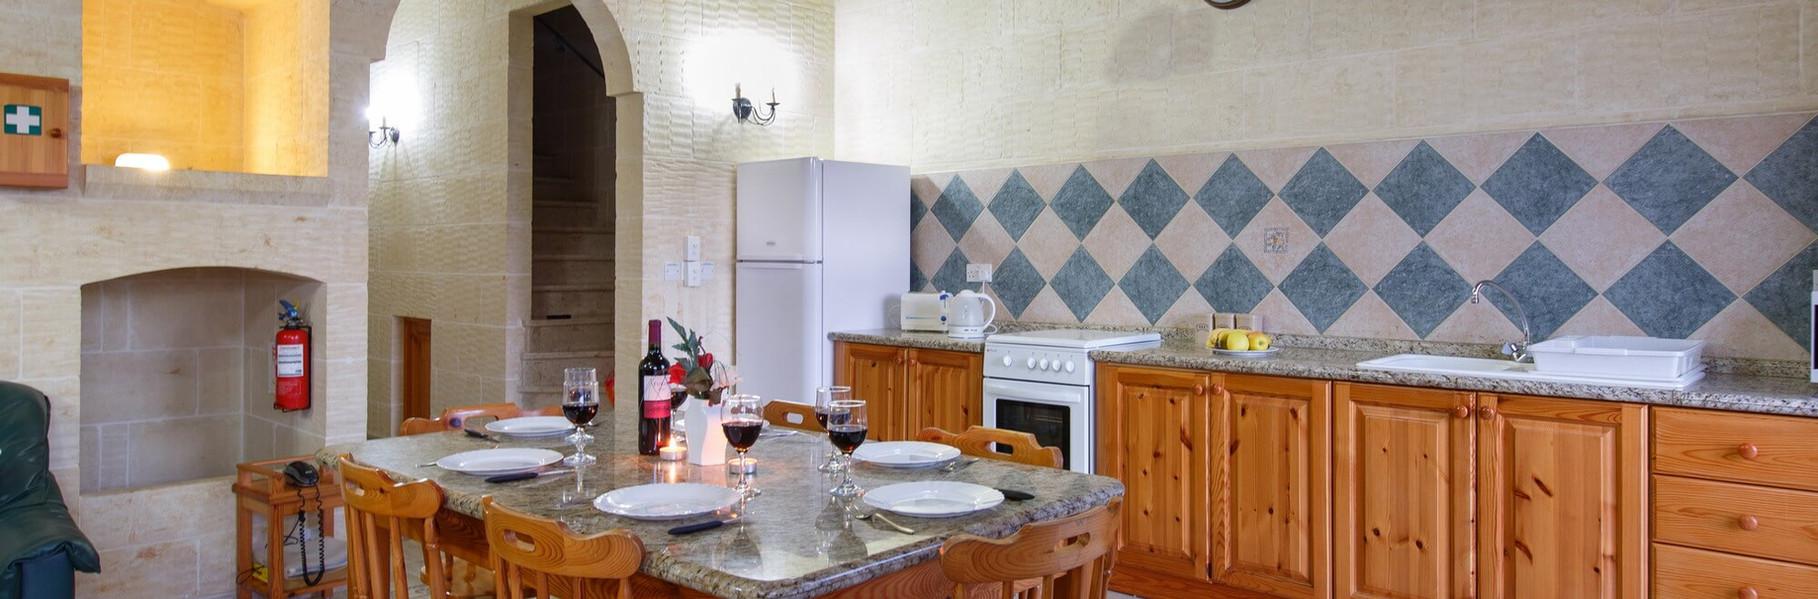 kitchen-dining-3dor.jpg